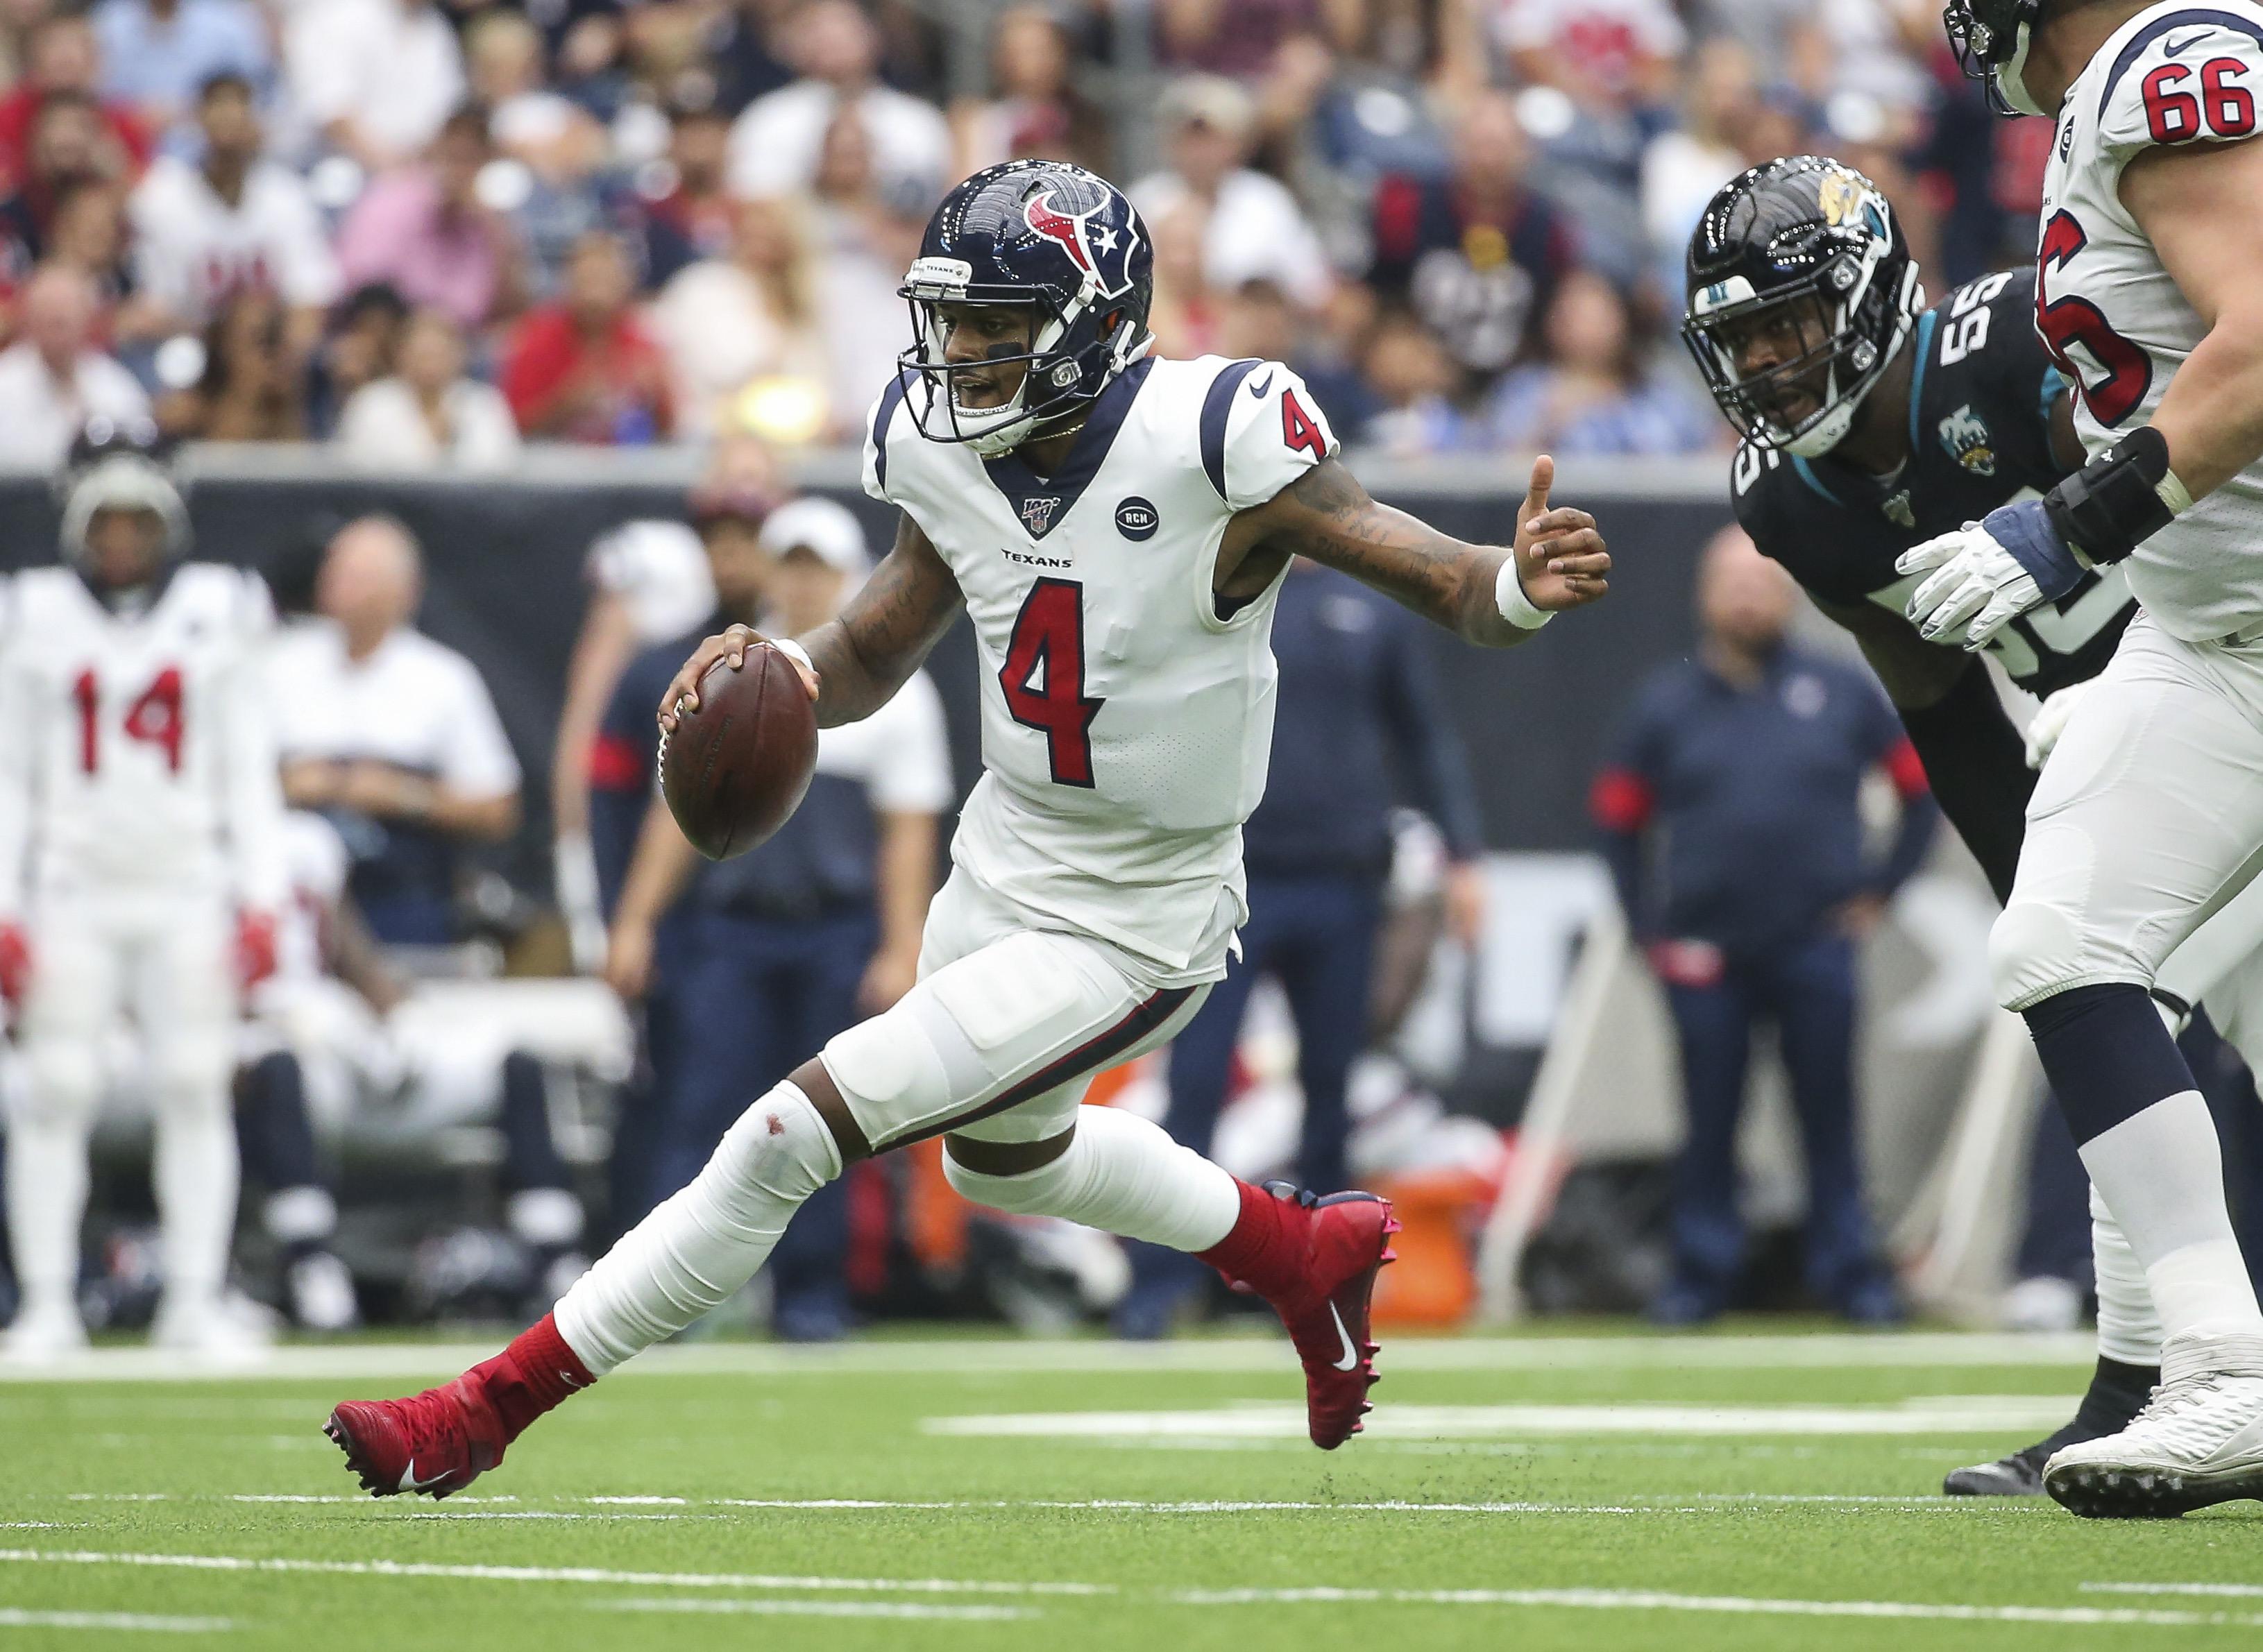 NFL: Jacksonville Jaguars at Houston Texans